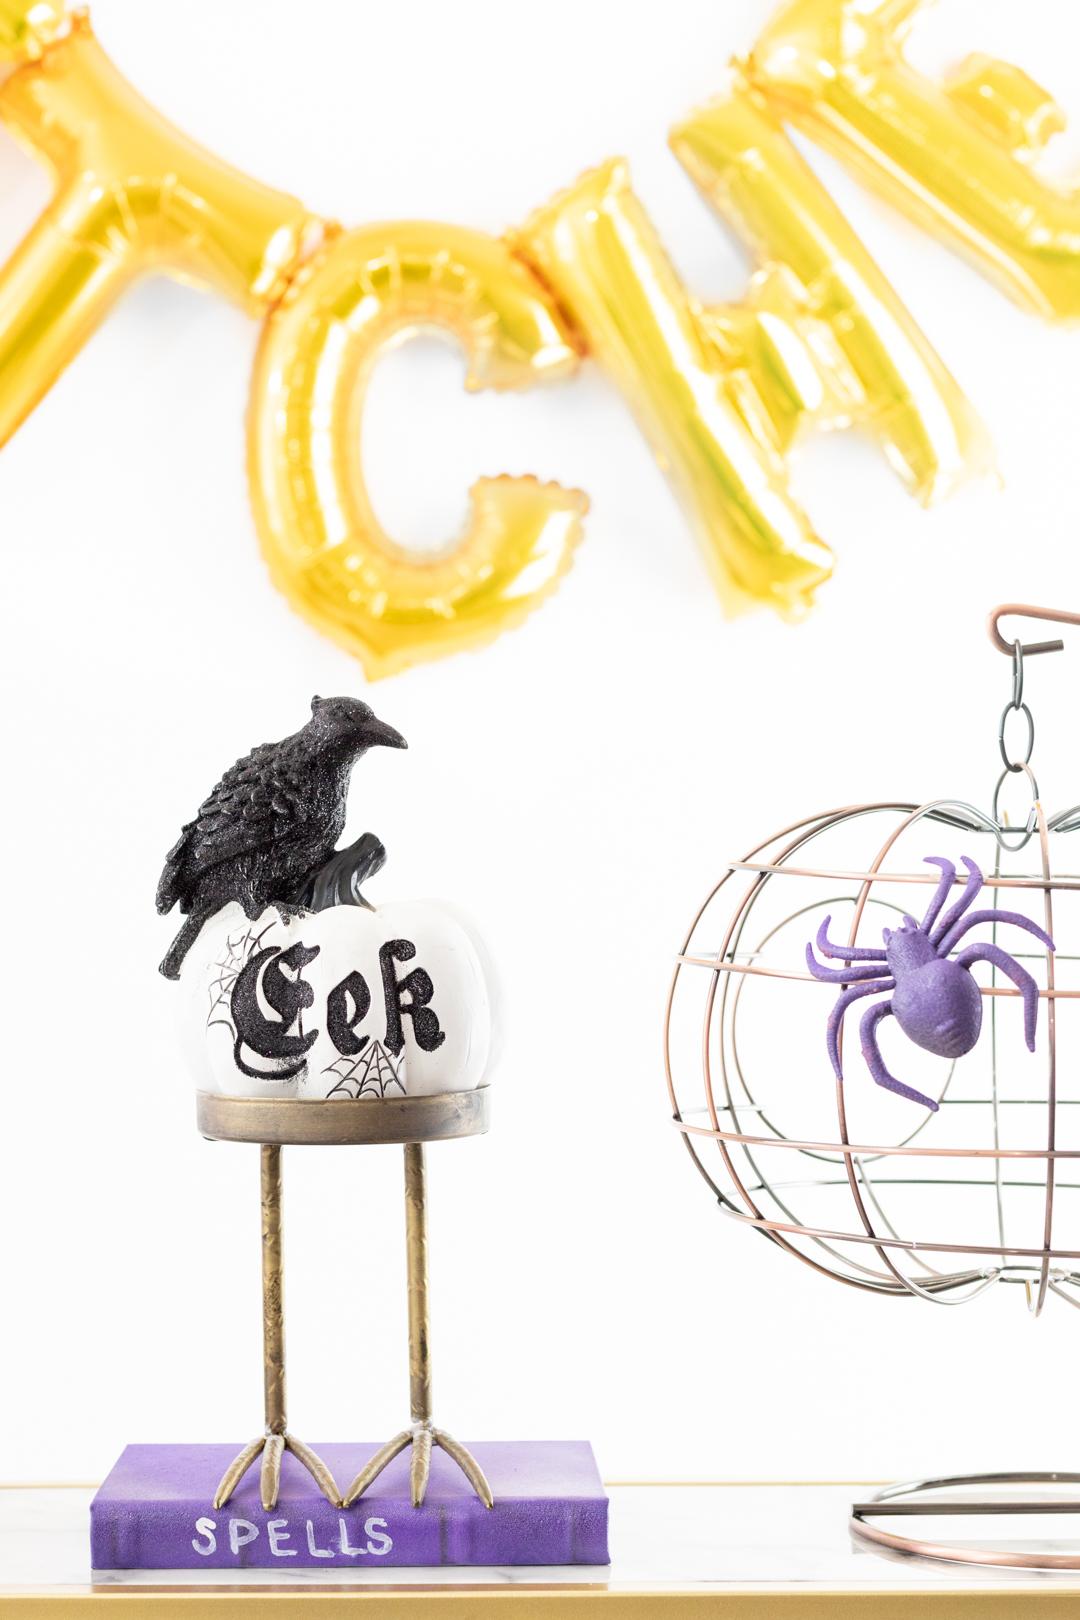 Eek pumpkin with crow on top.